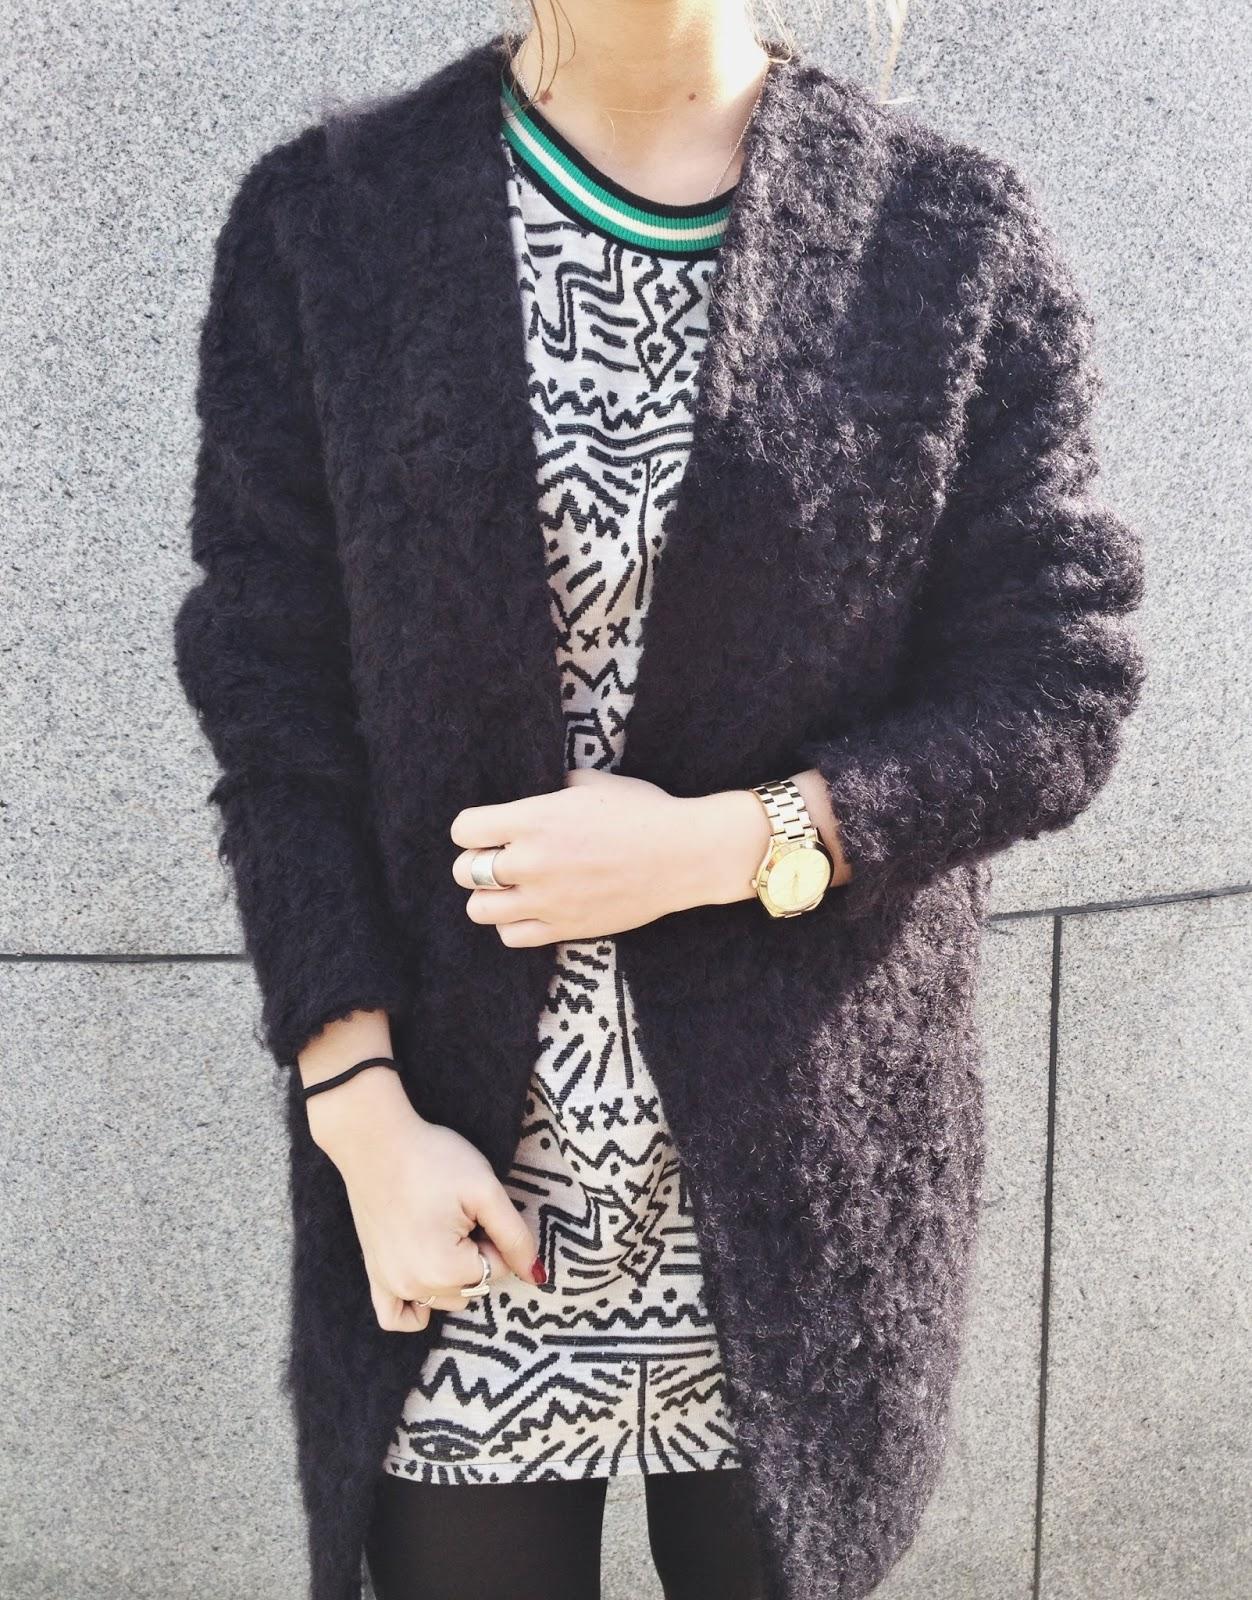 H&m Jumper Dress// New Blog